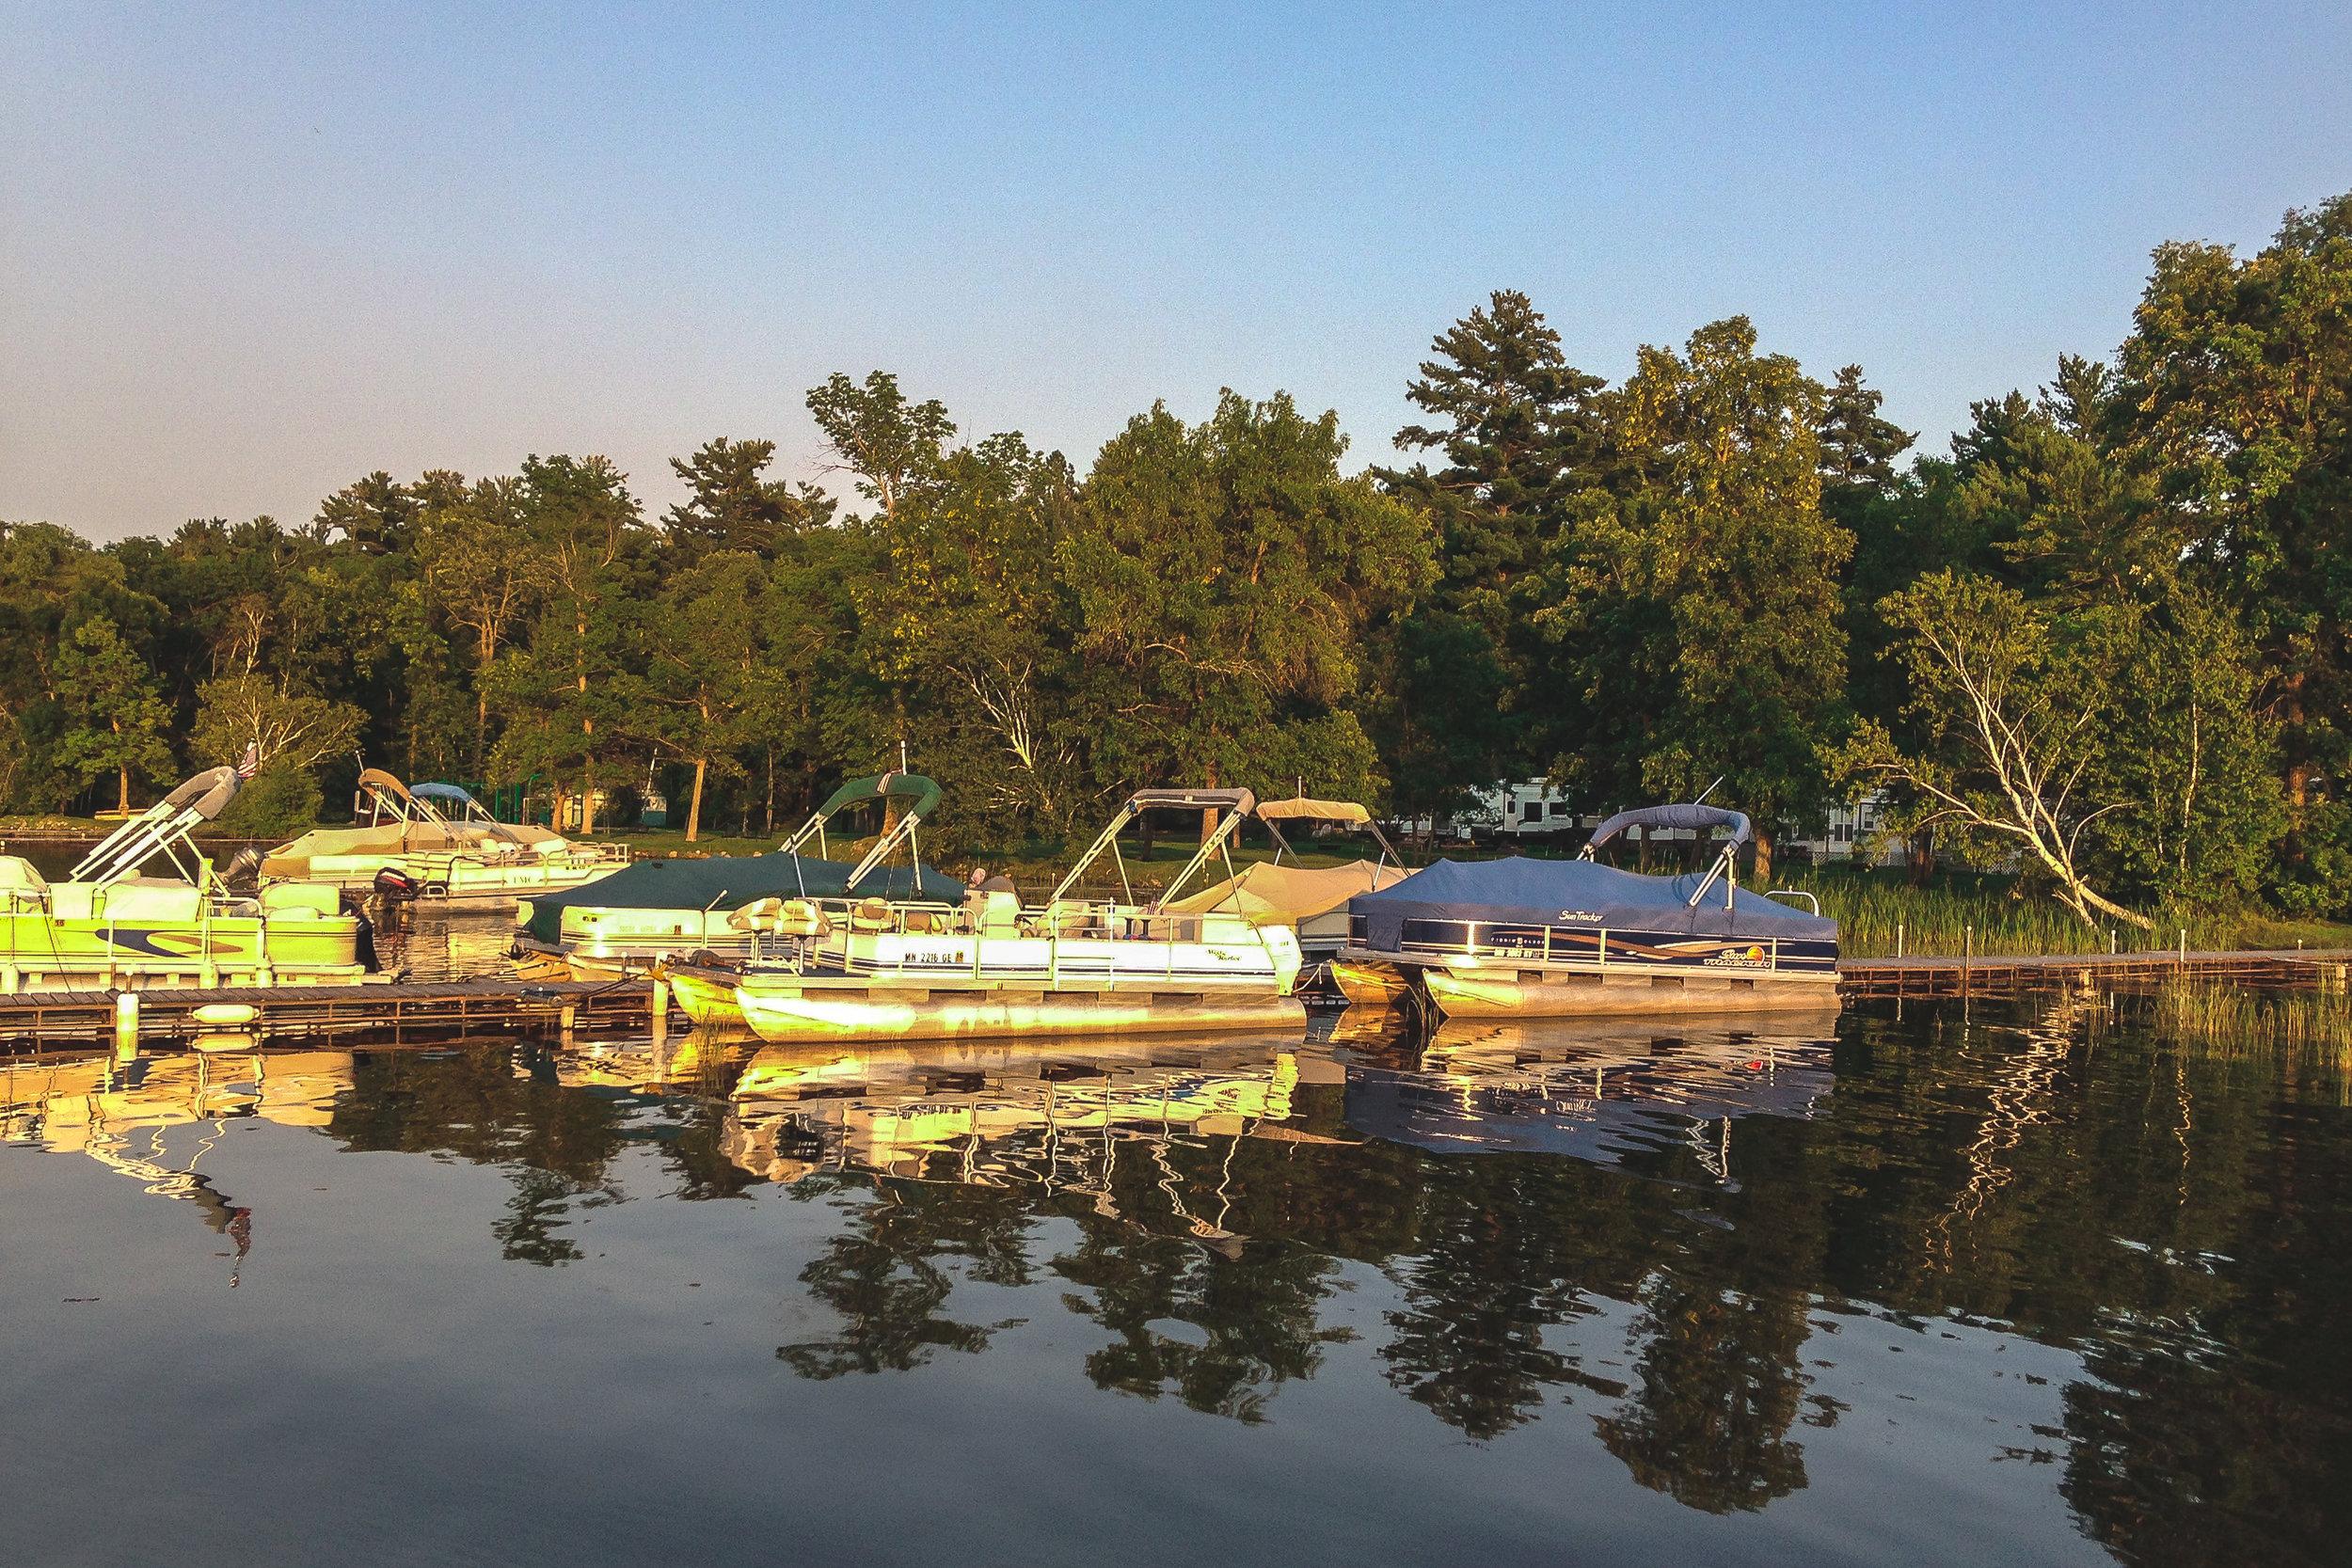 brainerd_lakes_area_campground (8 of 2).jpg